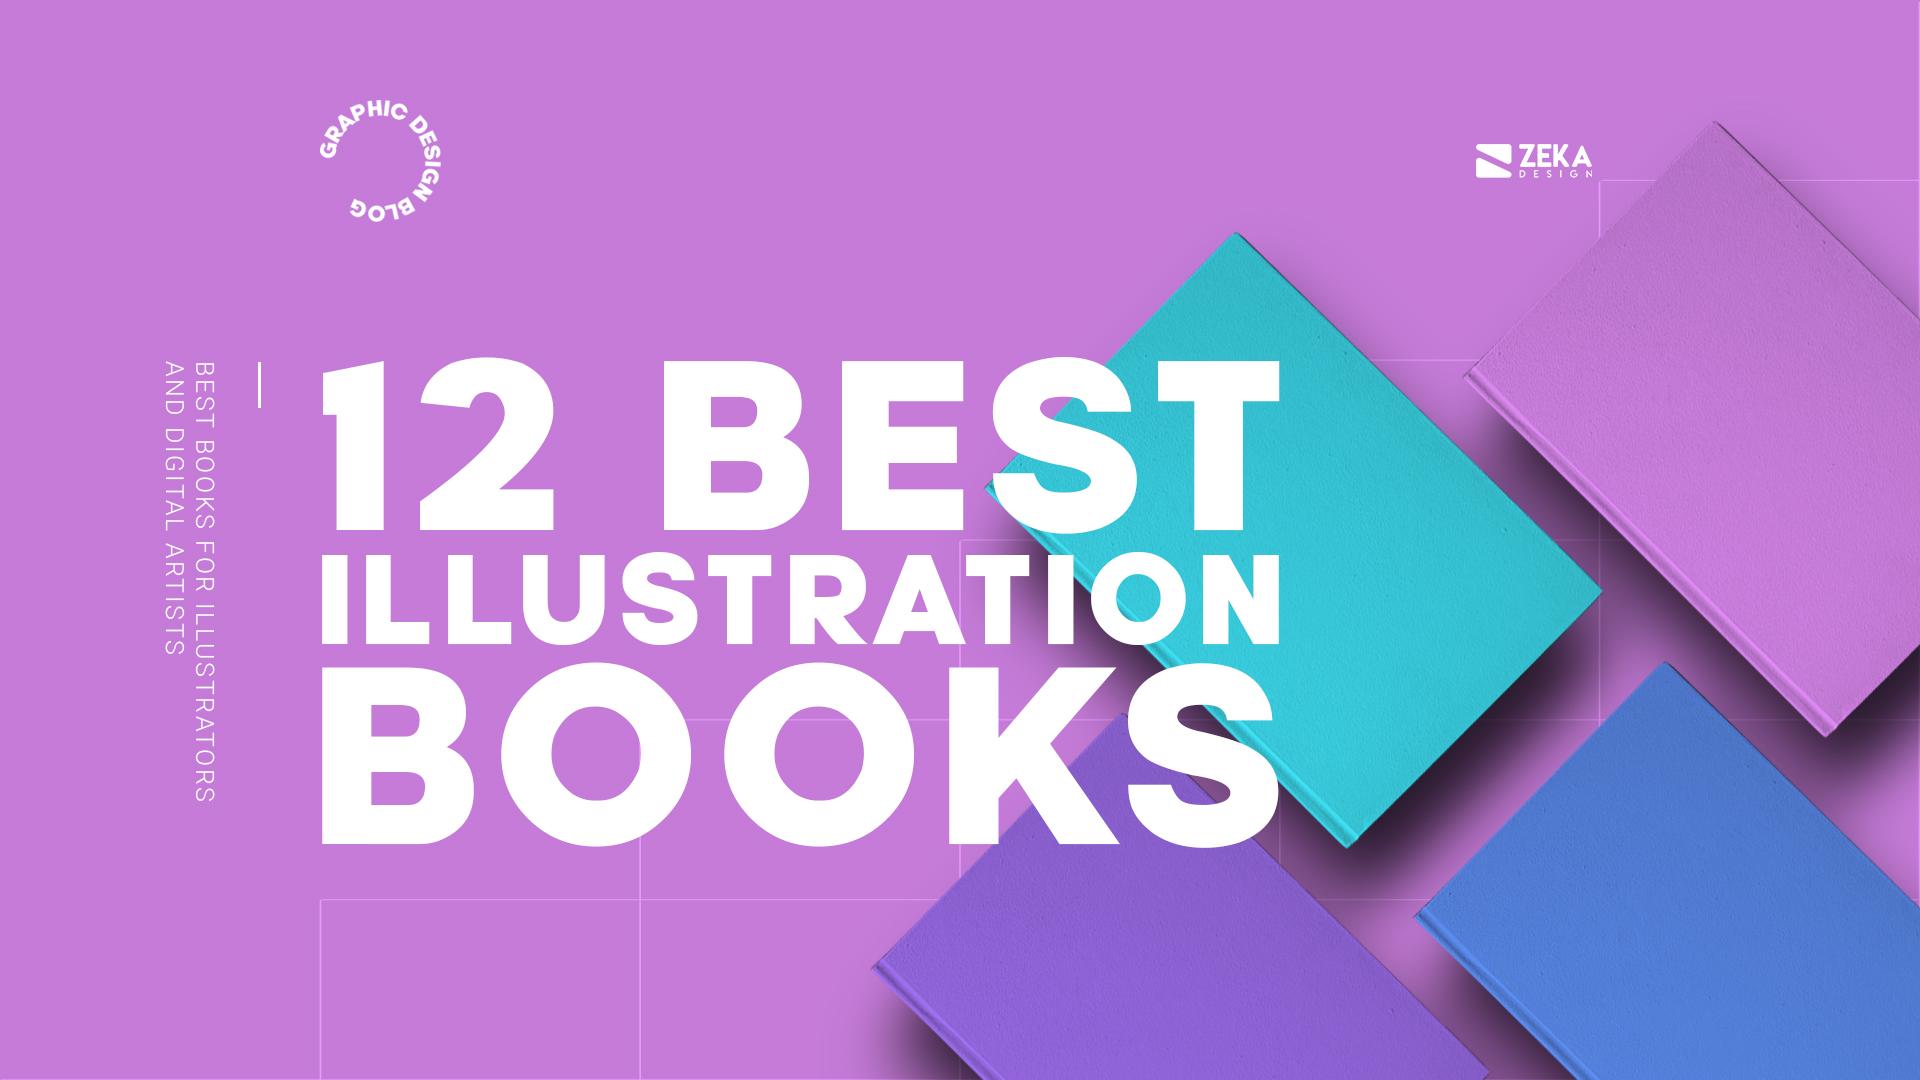 12 Best Illustration Books For Illustrators and Digital Artists